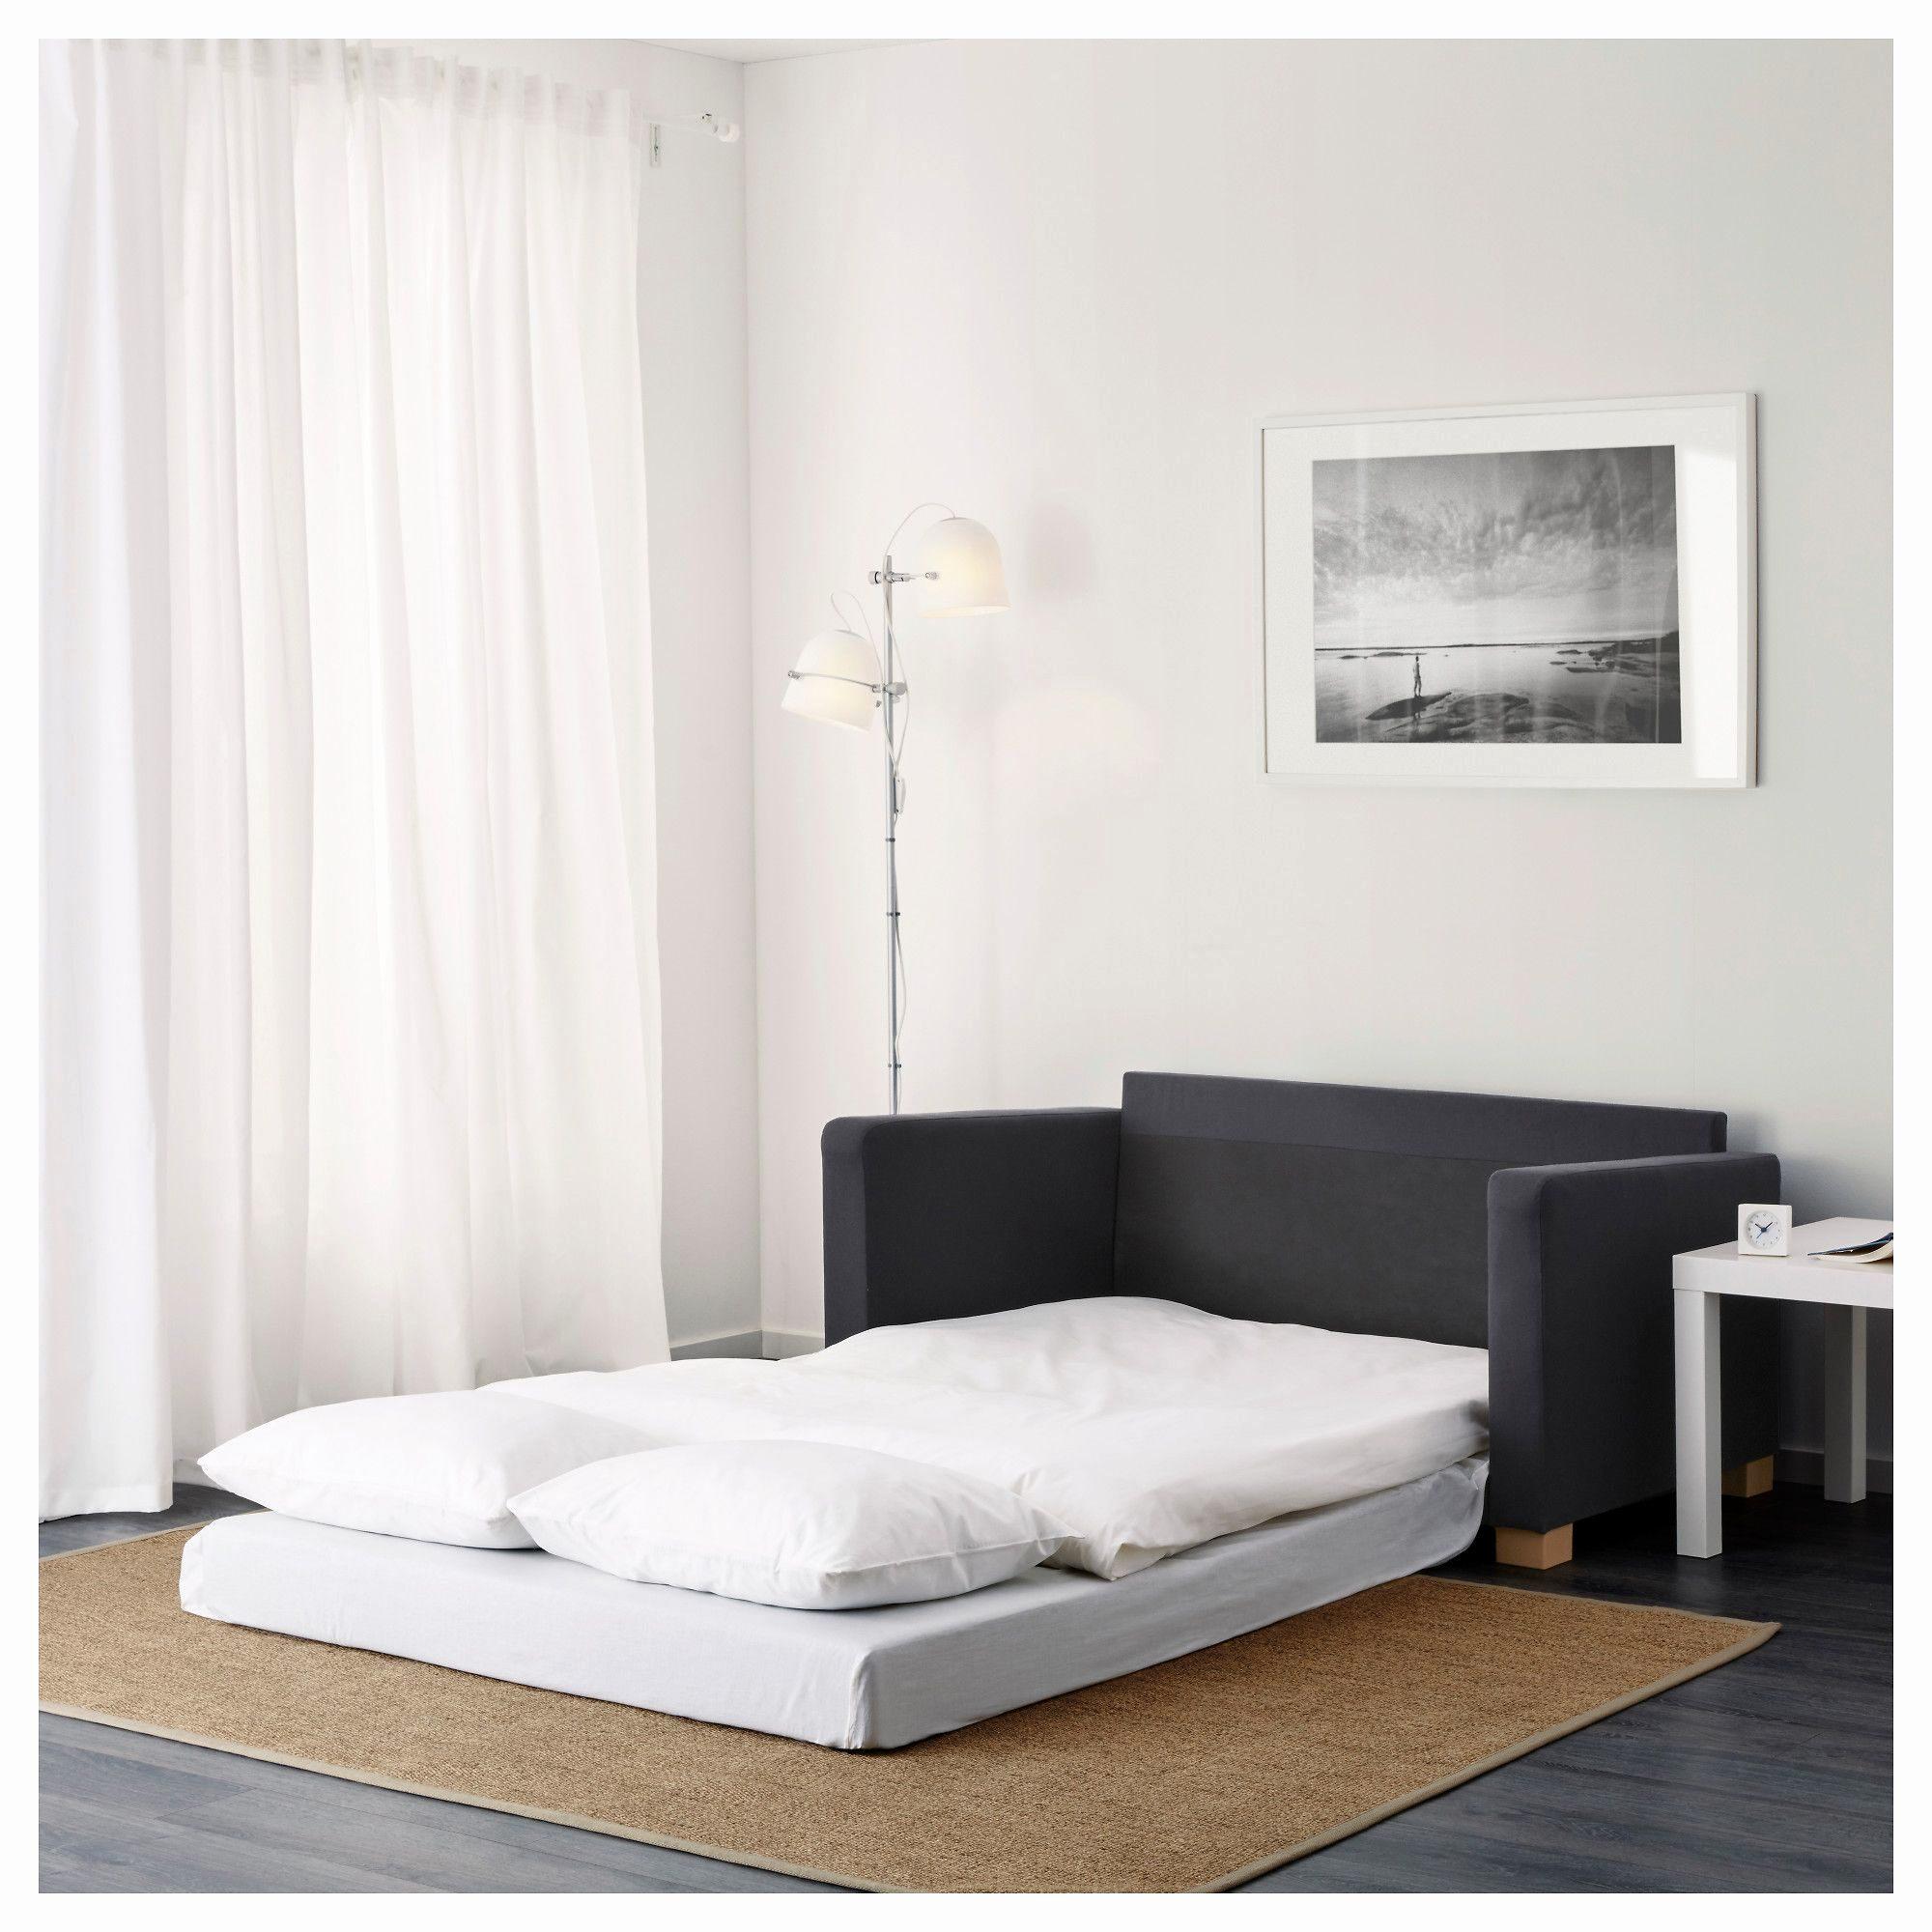 Lit Banquette Ikea Luxe Banquette Lit Ikea Inspirant Interior 50 Inspirational Ikea sofa